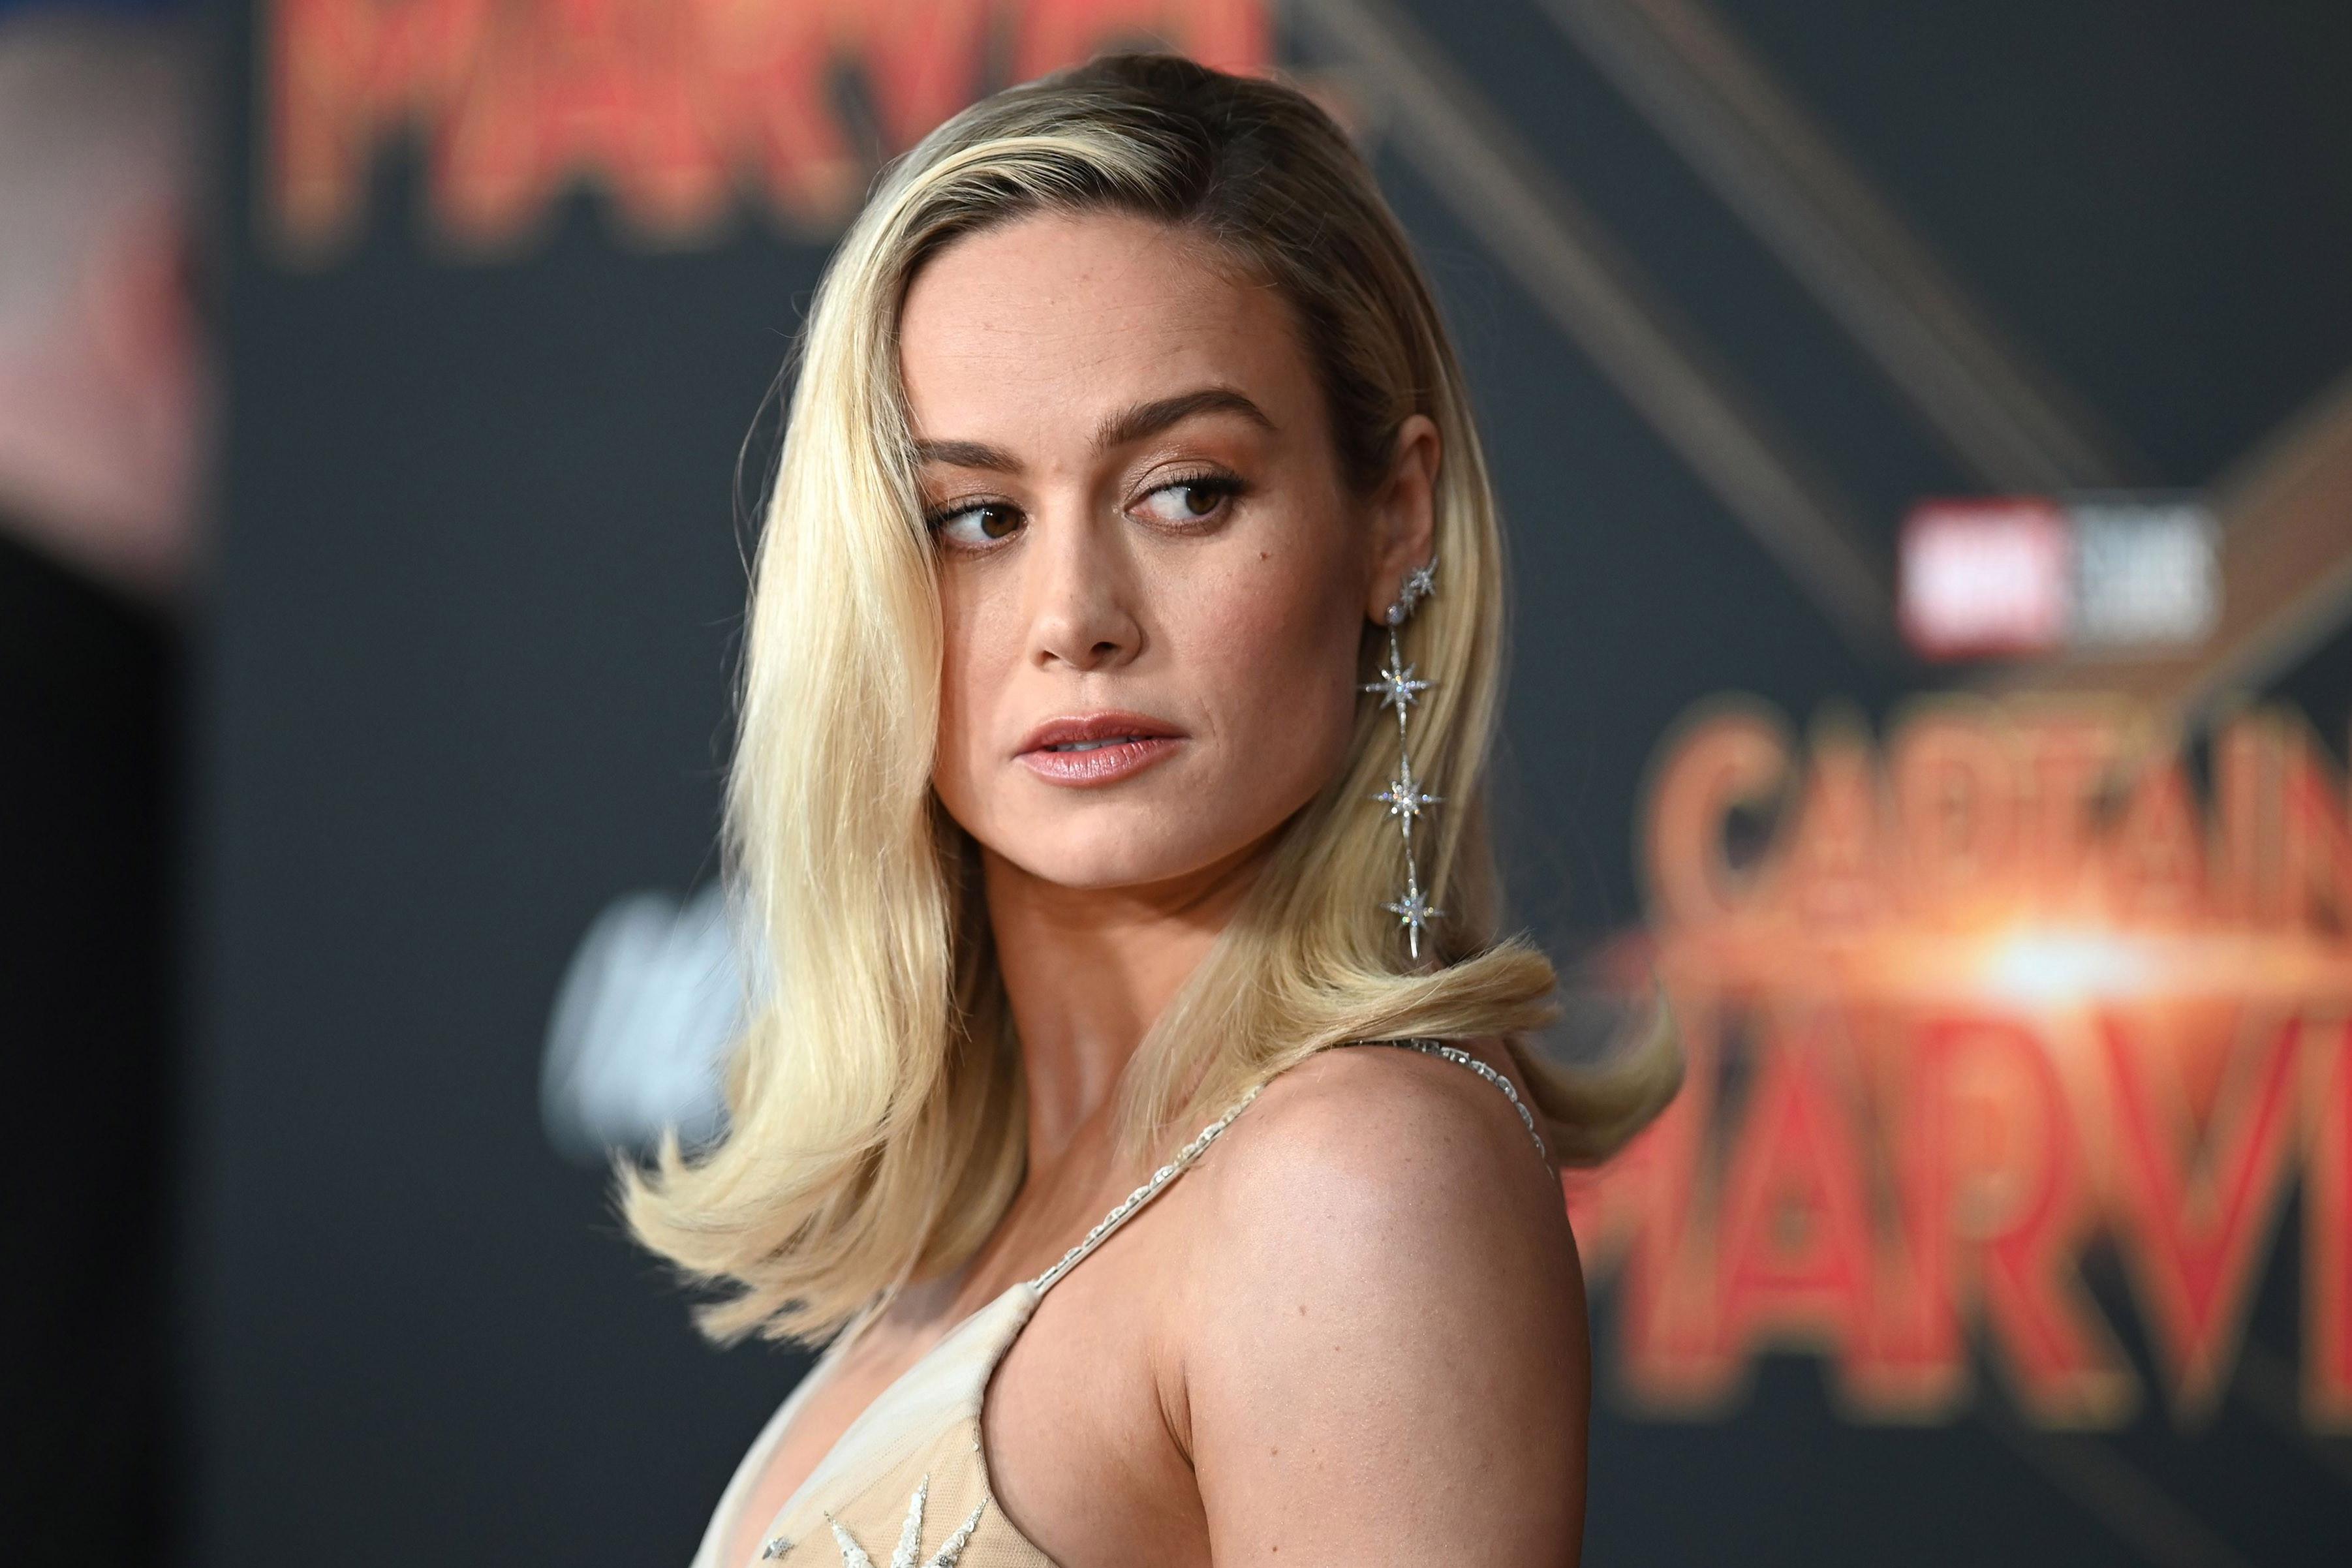 Boobs Brie Larson  nudes (26 images), Instagram, lingerie